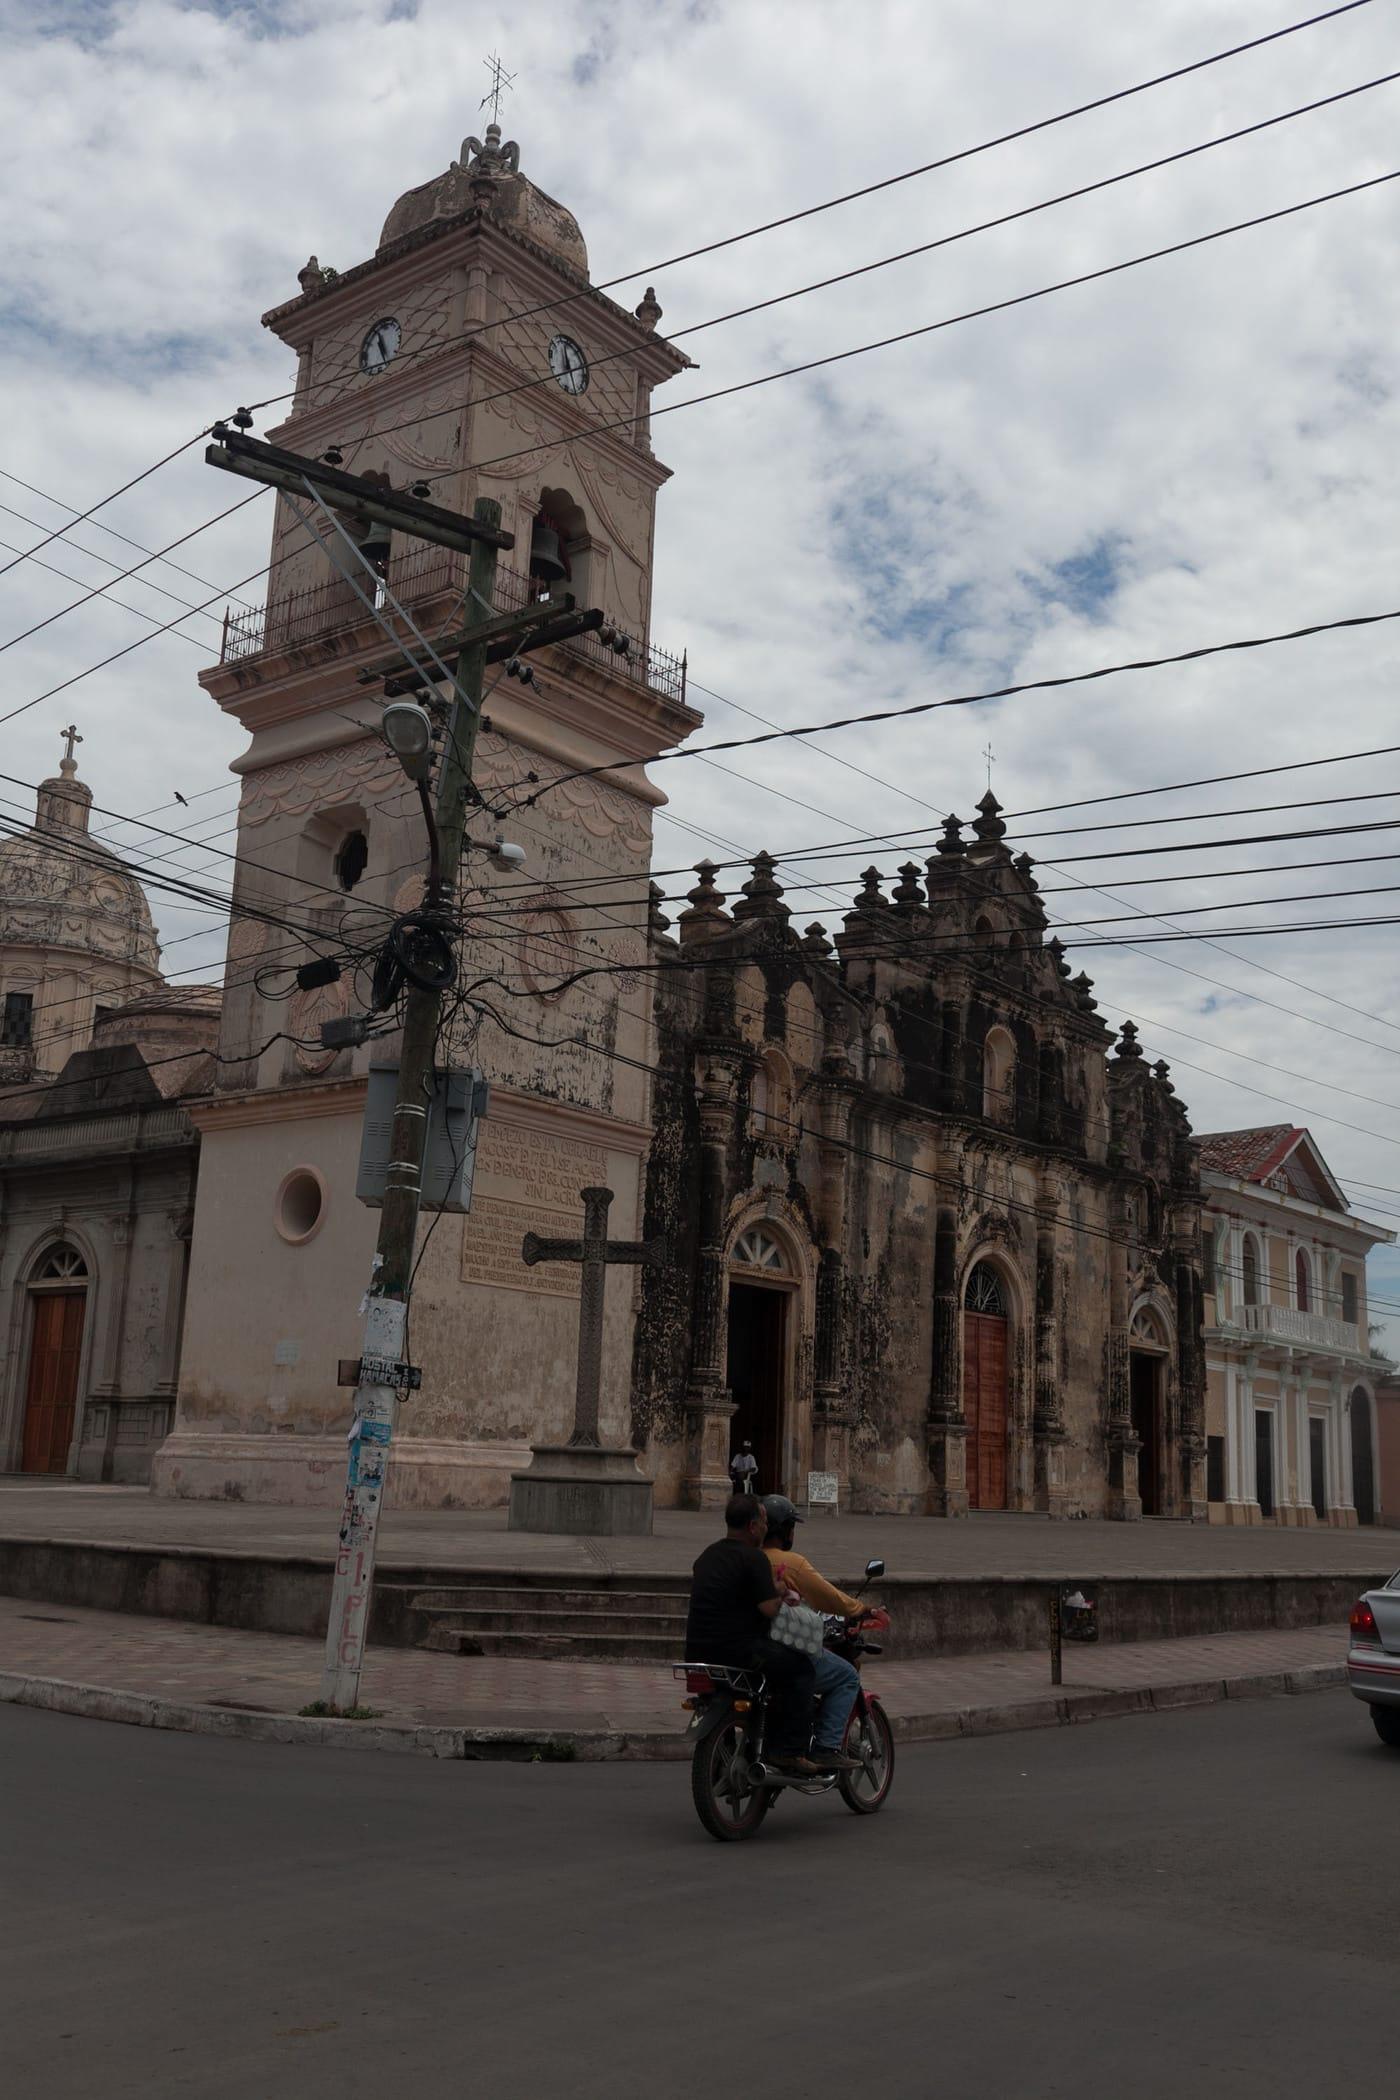 Tower La Merced Church in Granada, Nicaragua